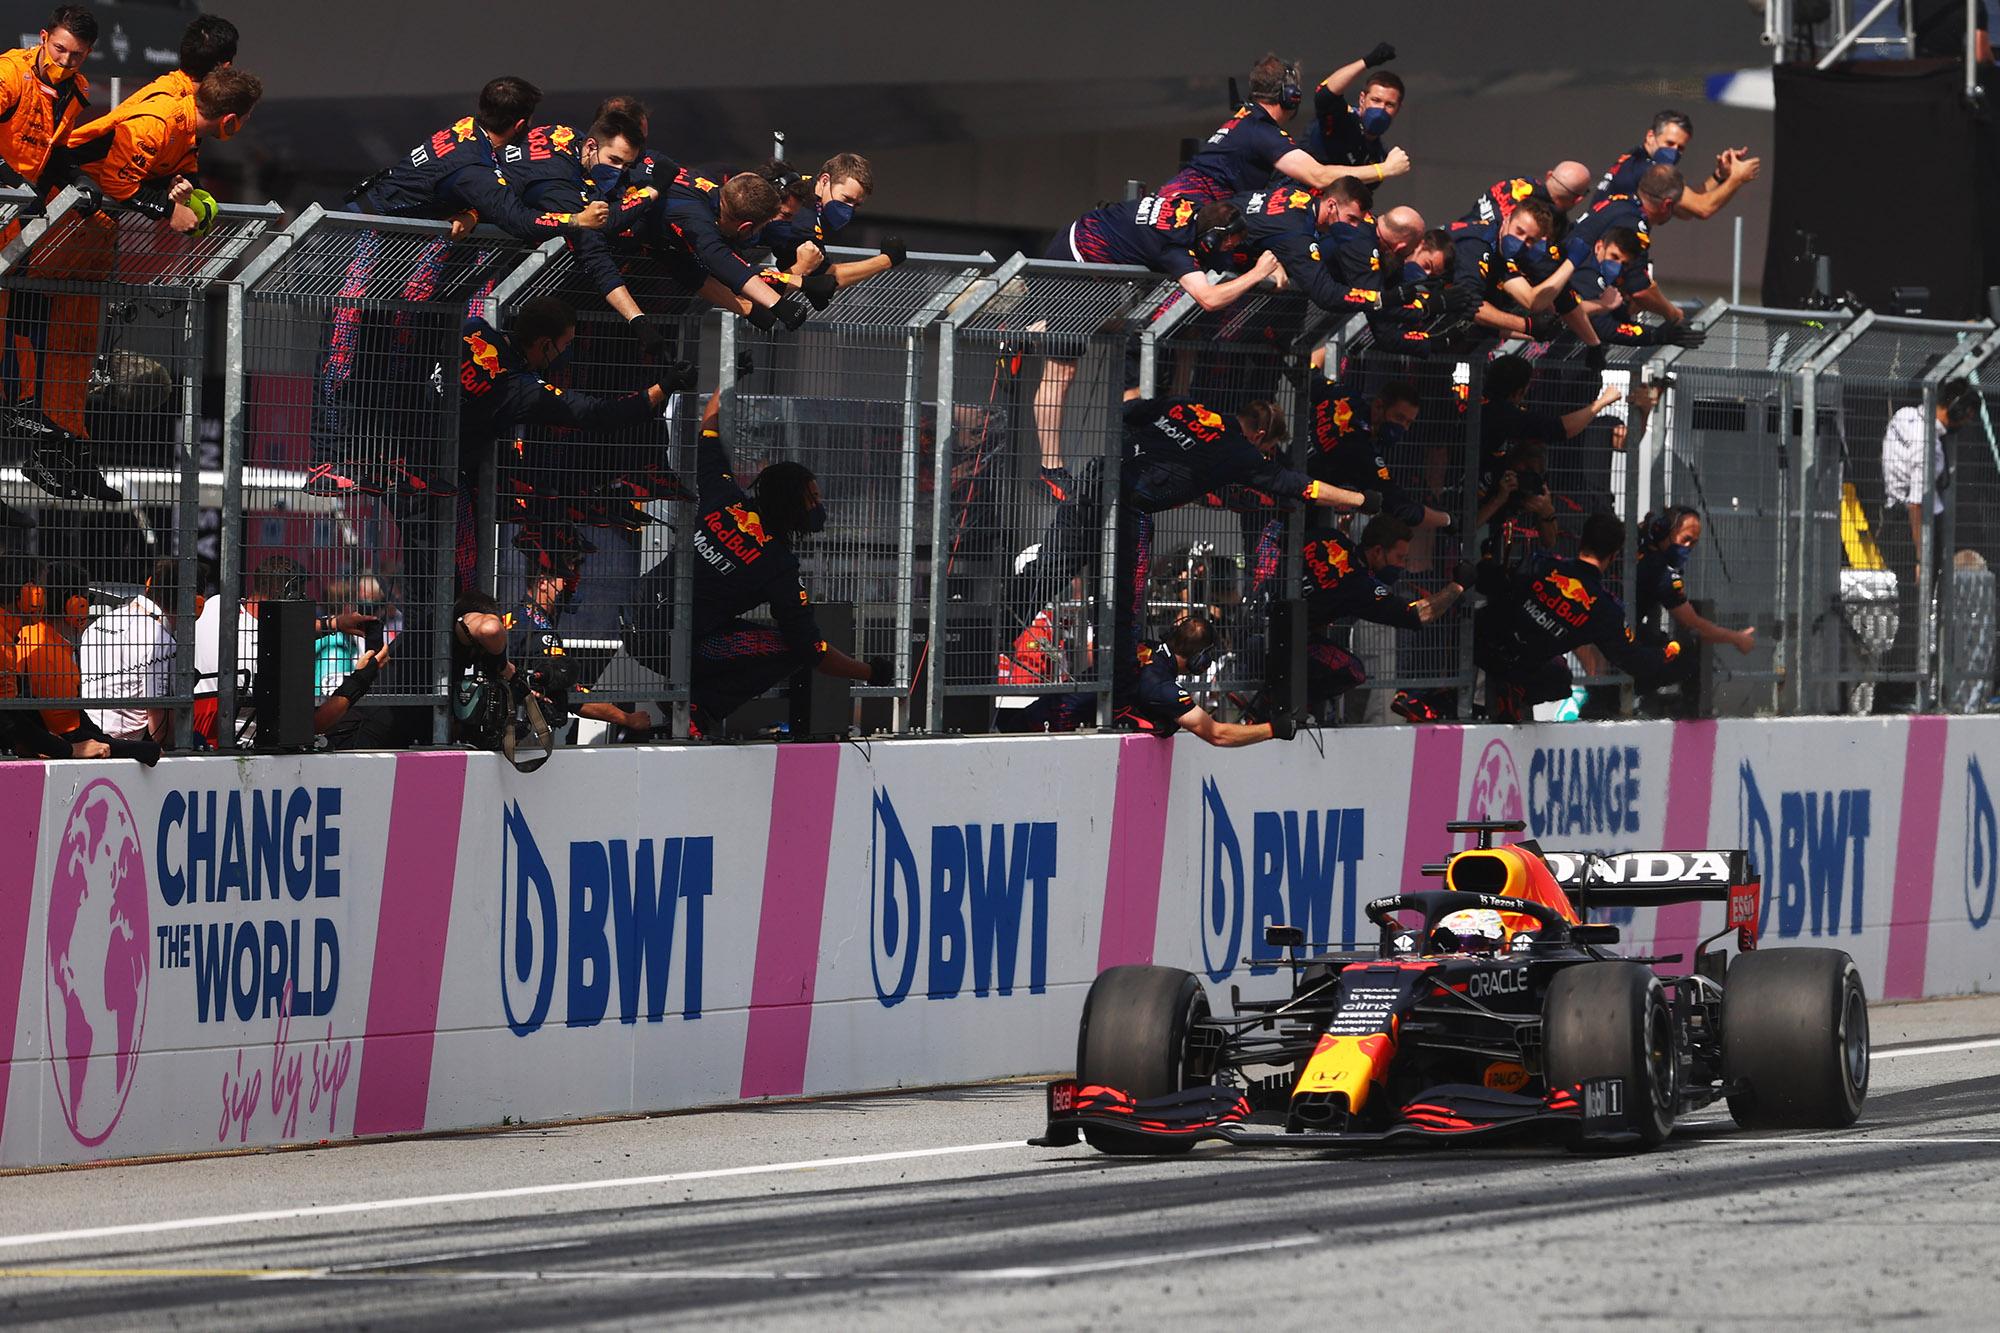 Max Verstappen cruzando a linha de chegada na Áustria